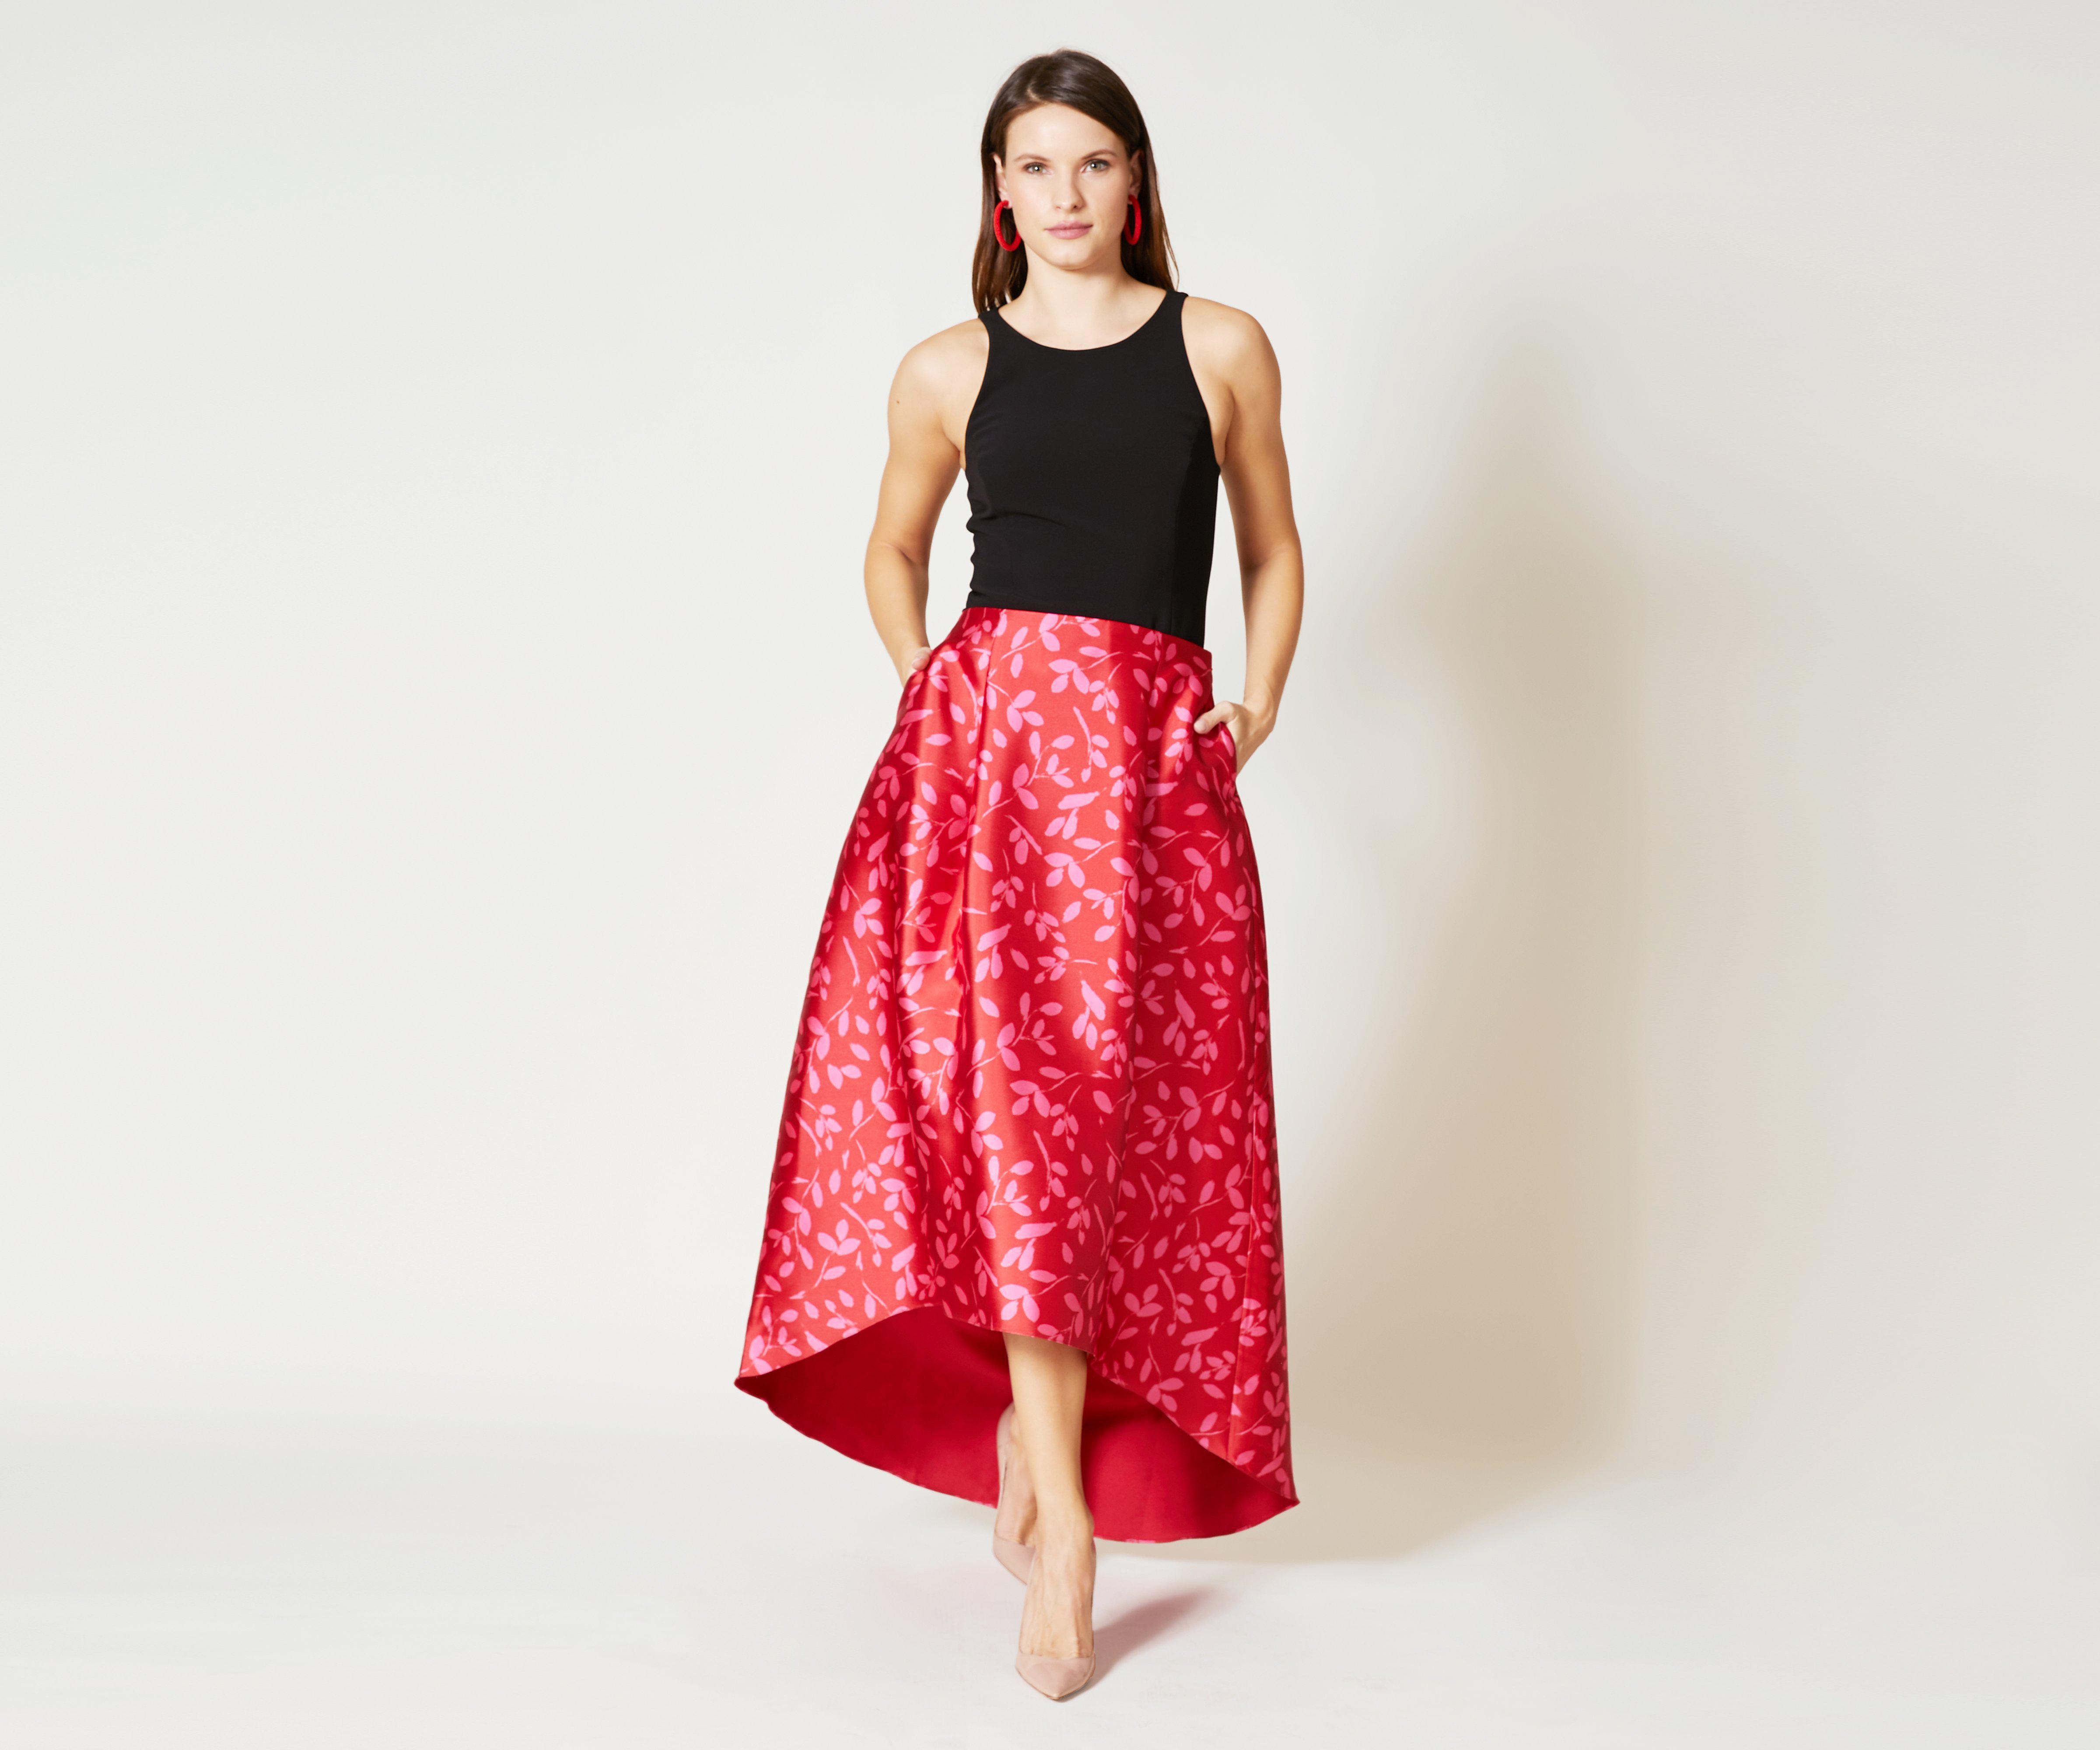 42595df8b6 Sachin & Babi Avalon Printed Skirt in Red - Save 59% - Lyst